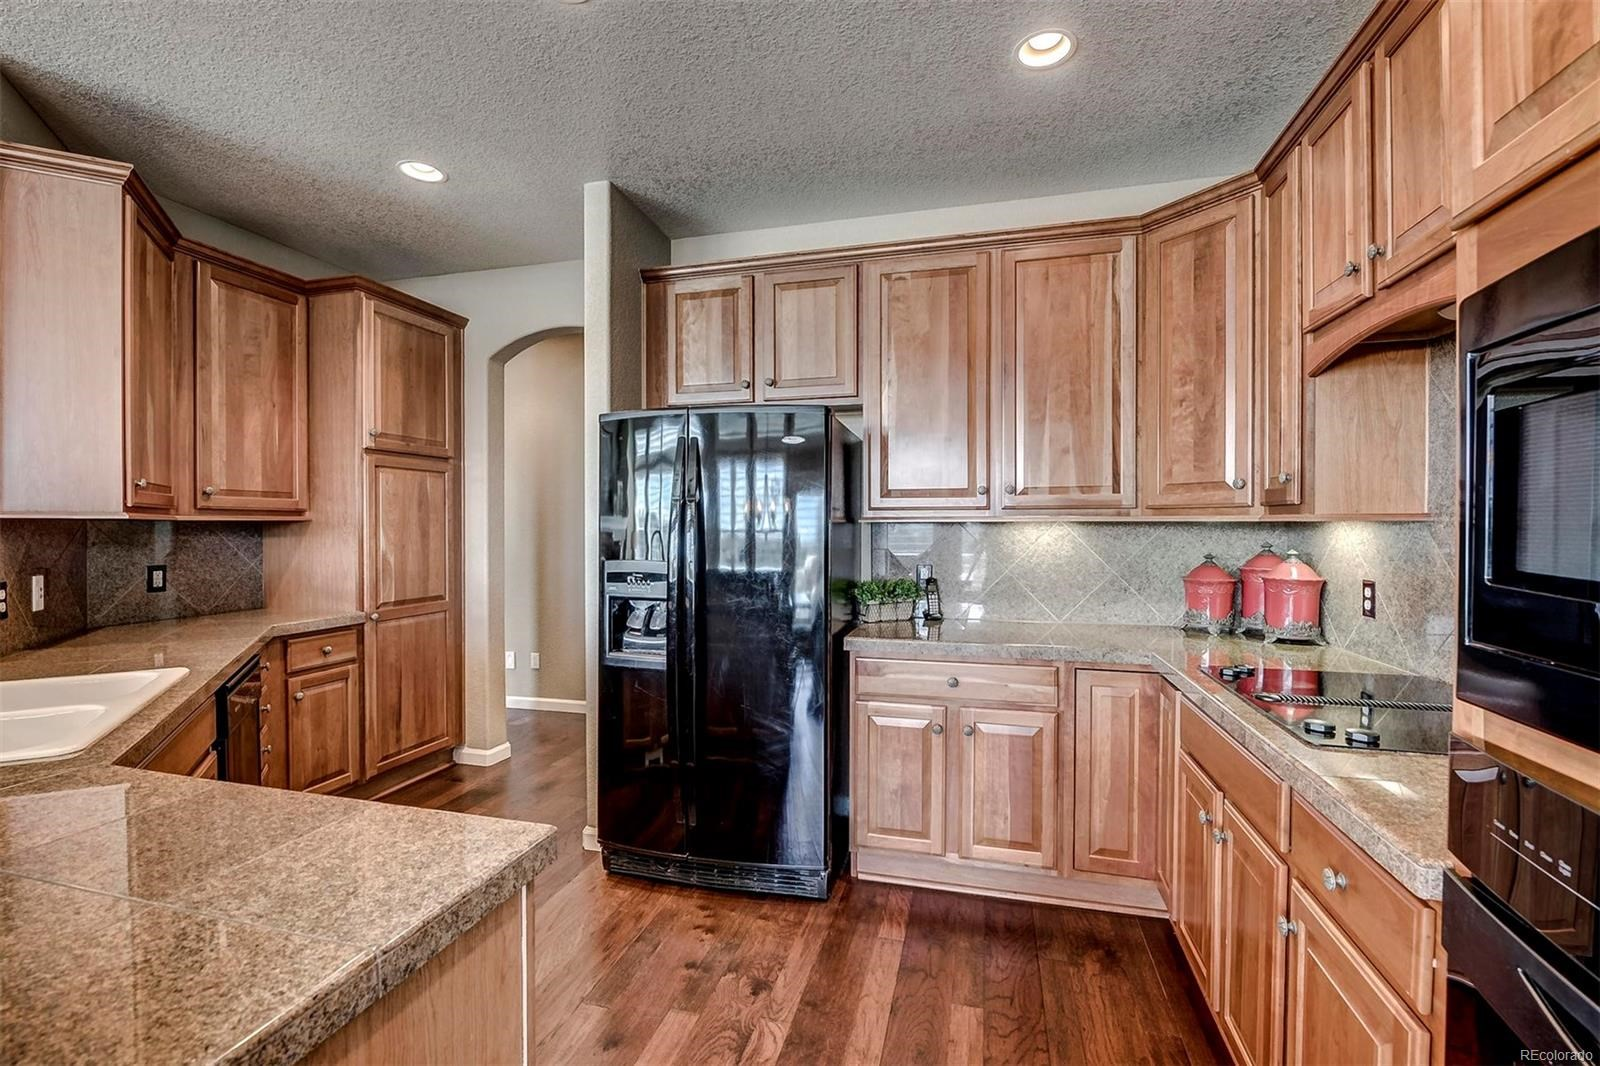 MLS# 9352060 - 1 - 1070  Bramblewood Drive, Castle Pines, CO 80108